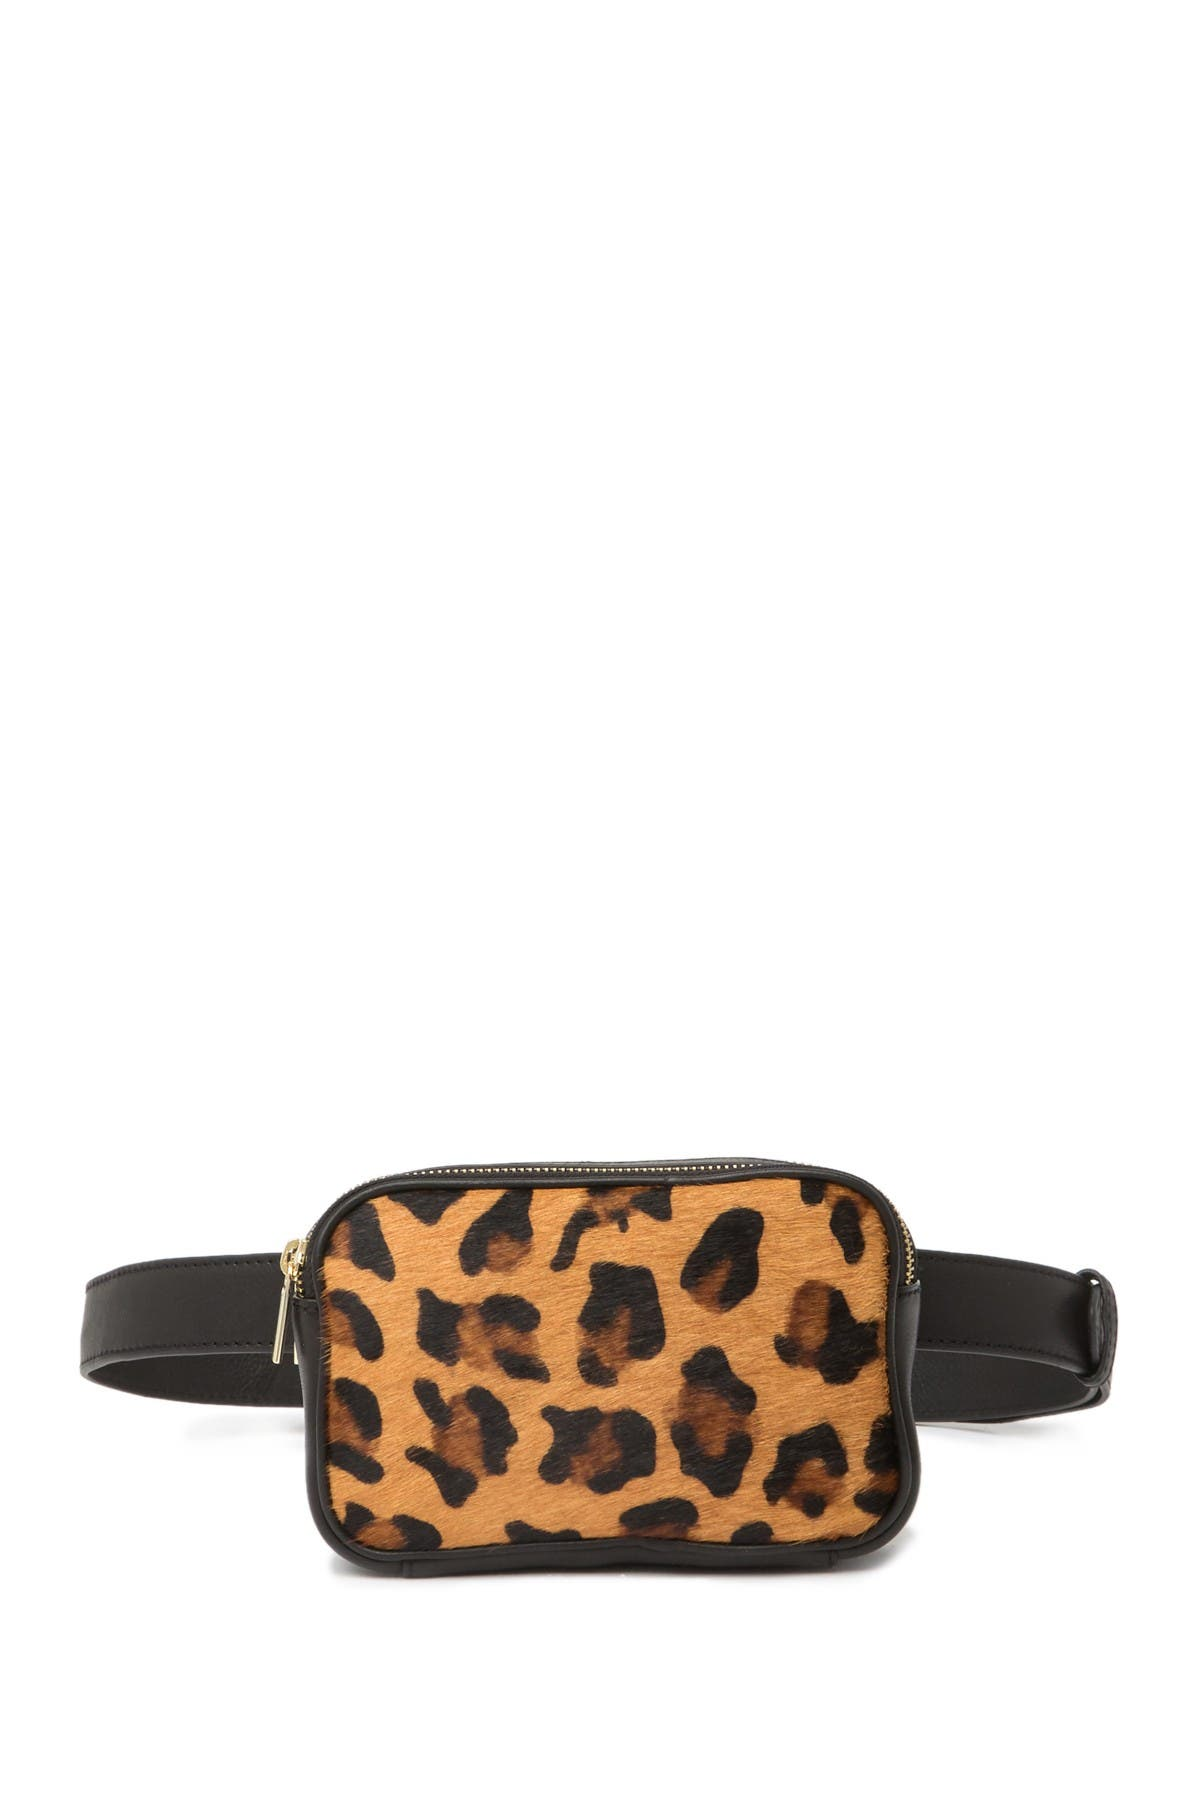 Image of TMRW STUDIO Alexander Genuine Shearling Belt Bag